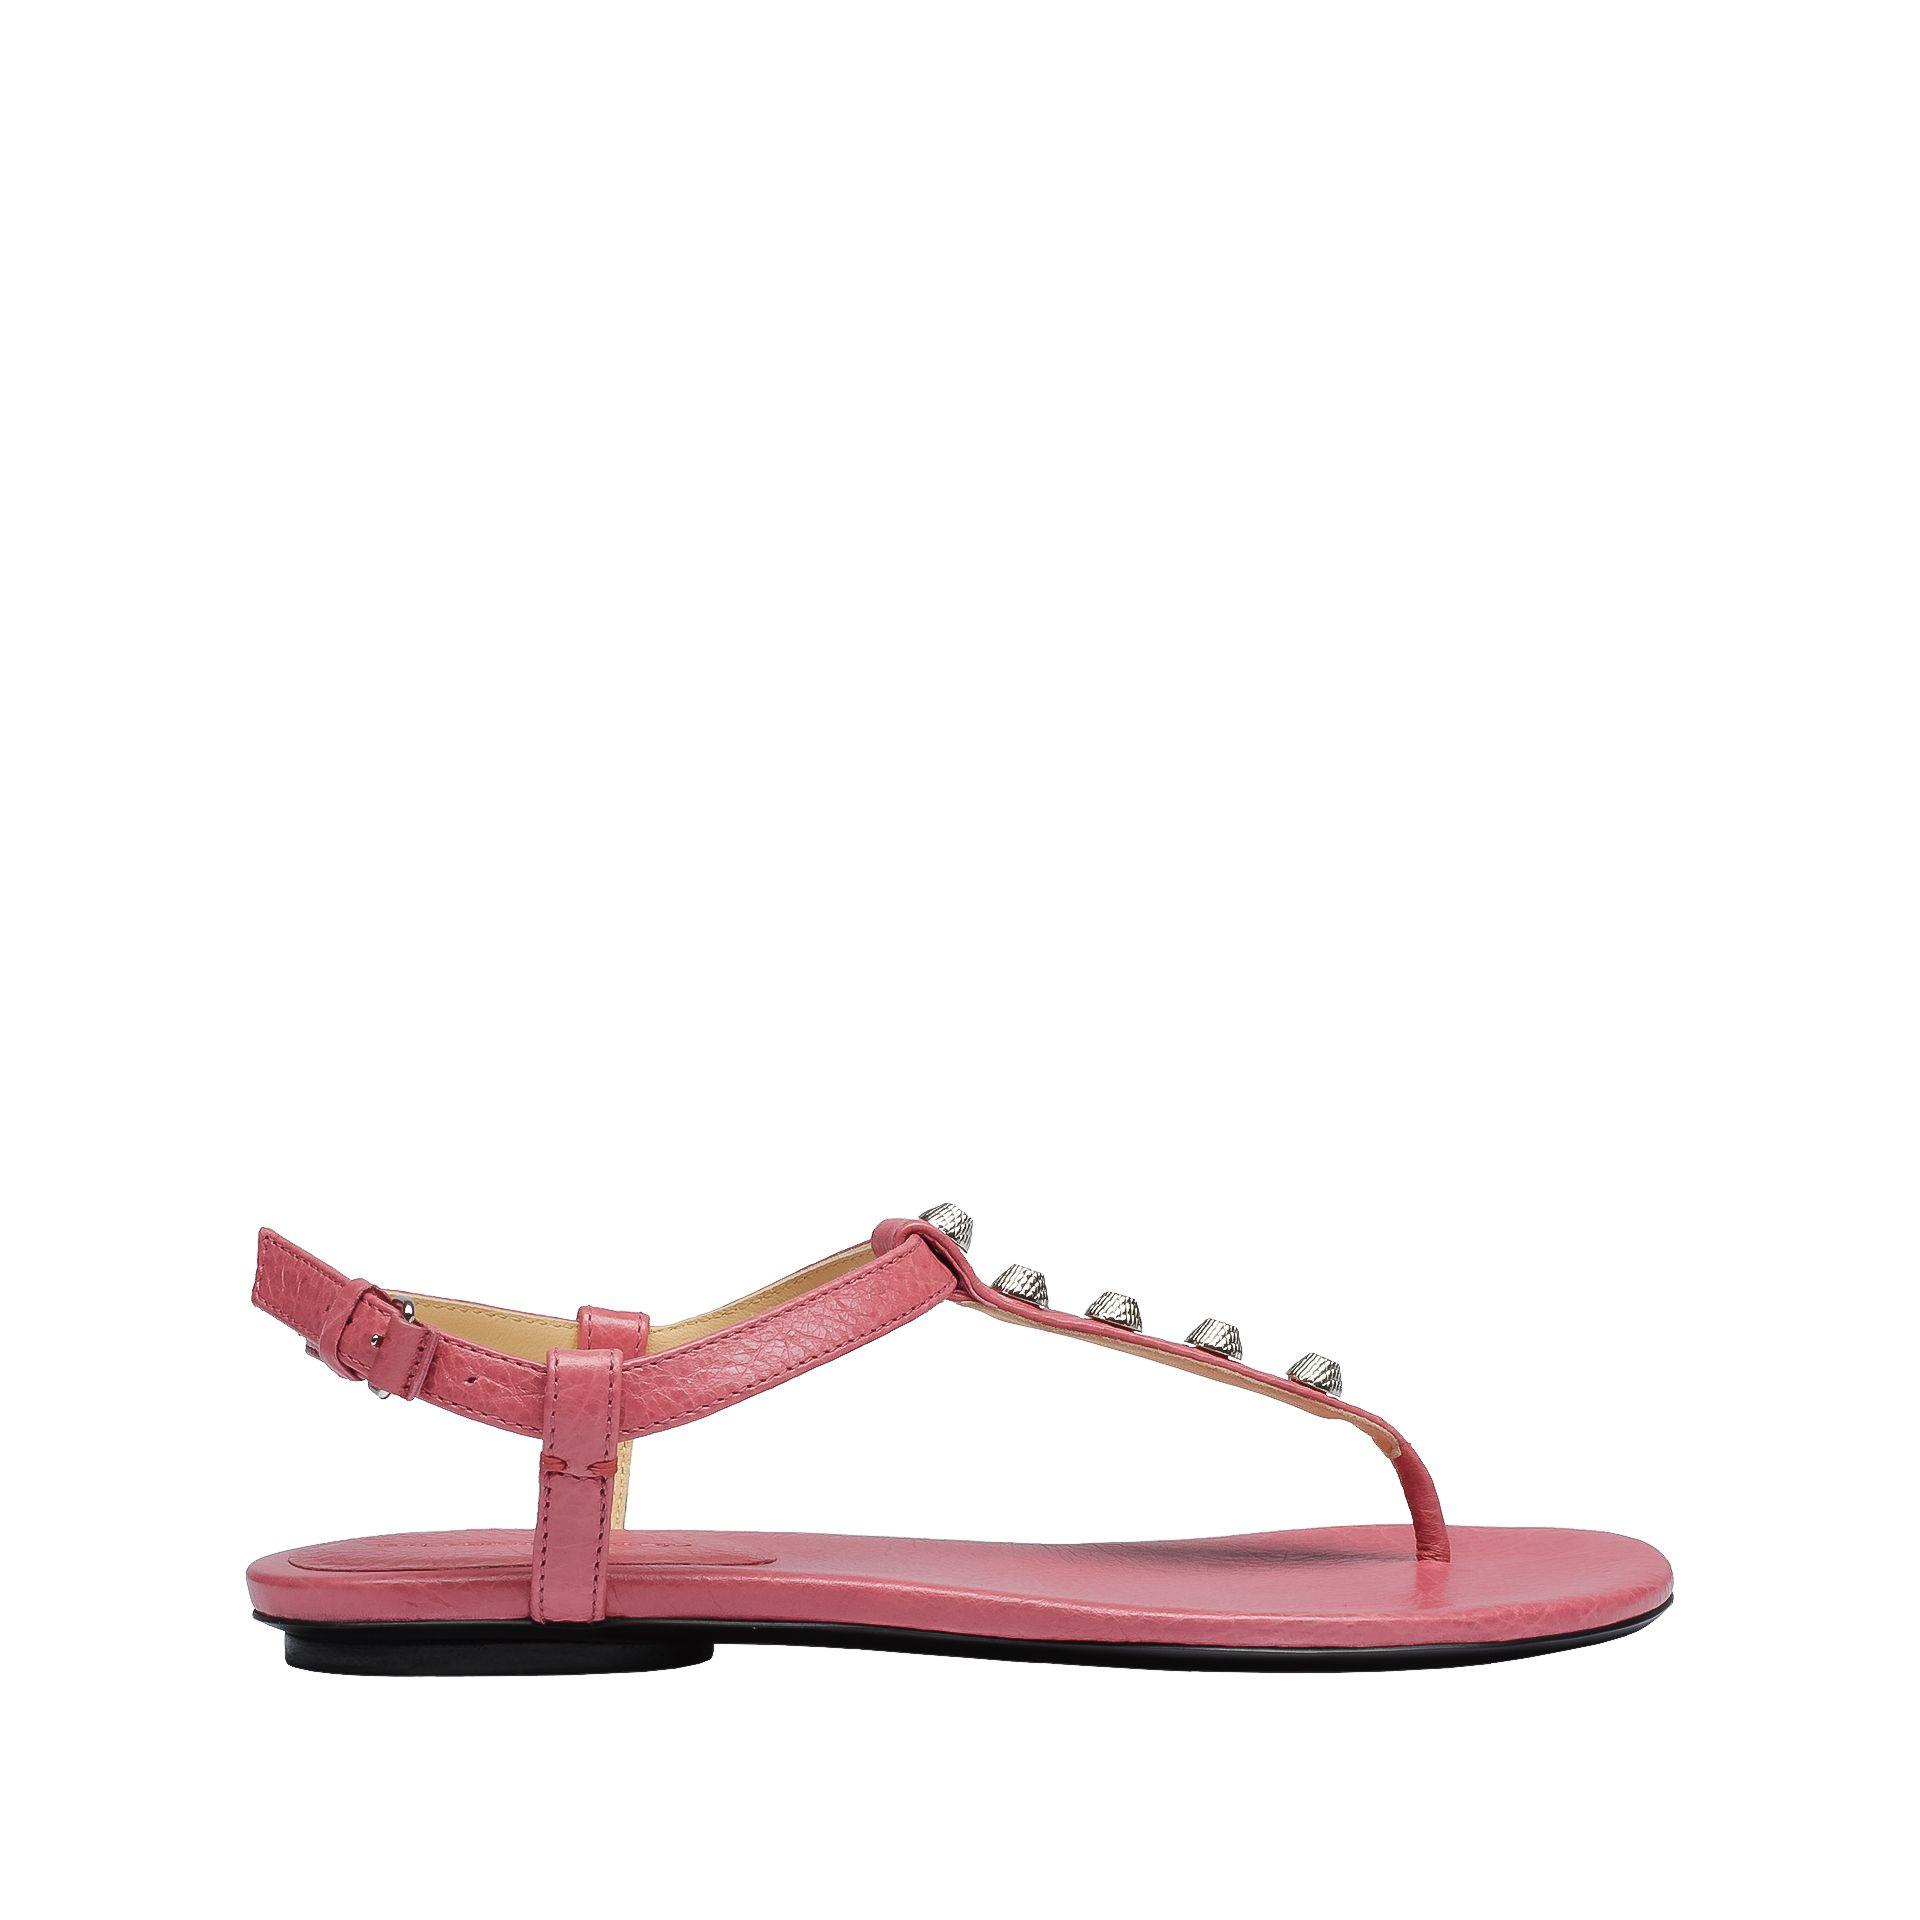 Balenciaga Giant Sandales Entredoigts Plates Argent